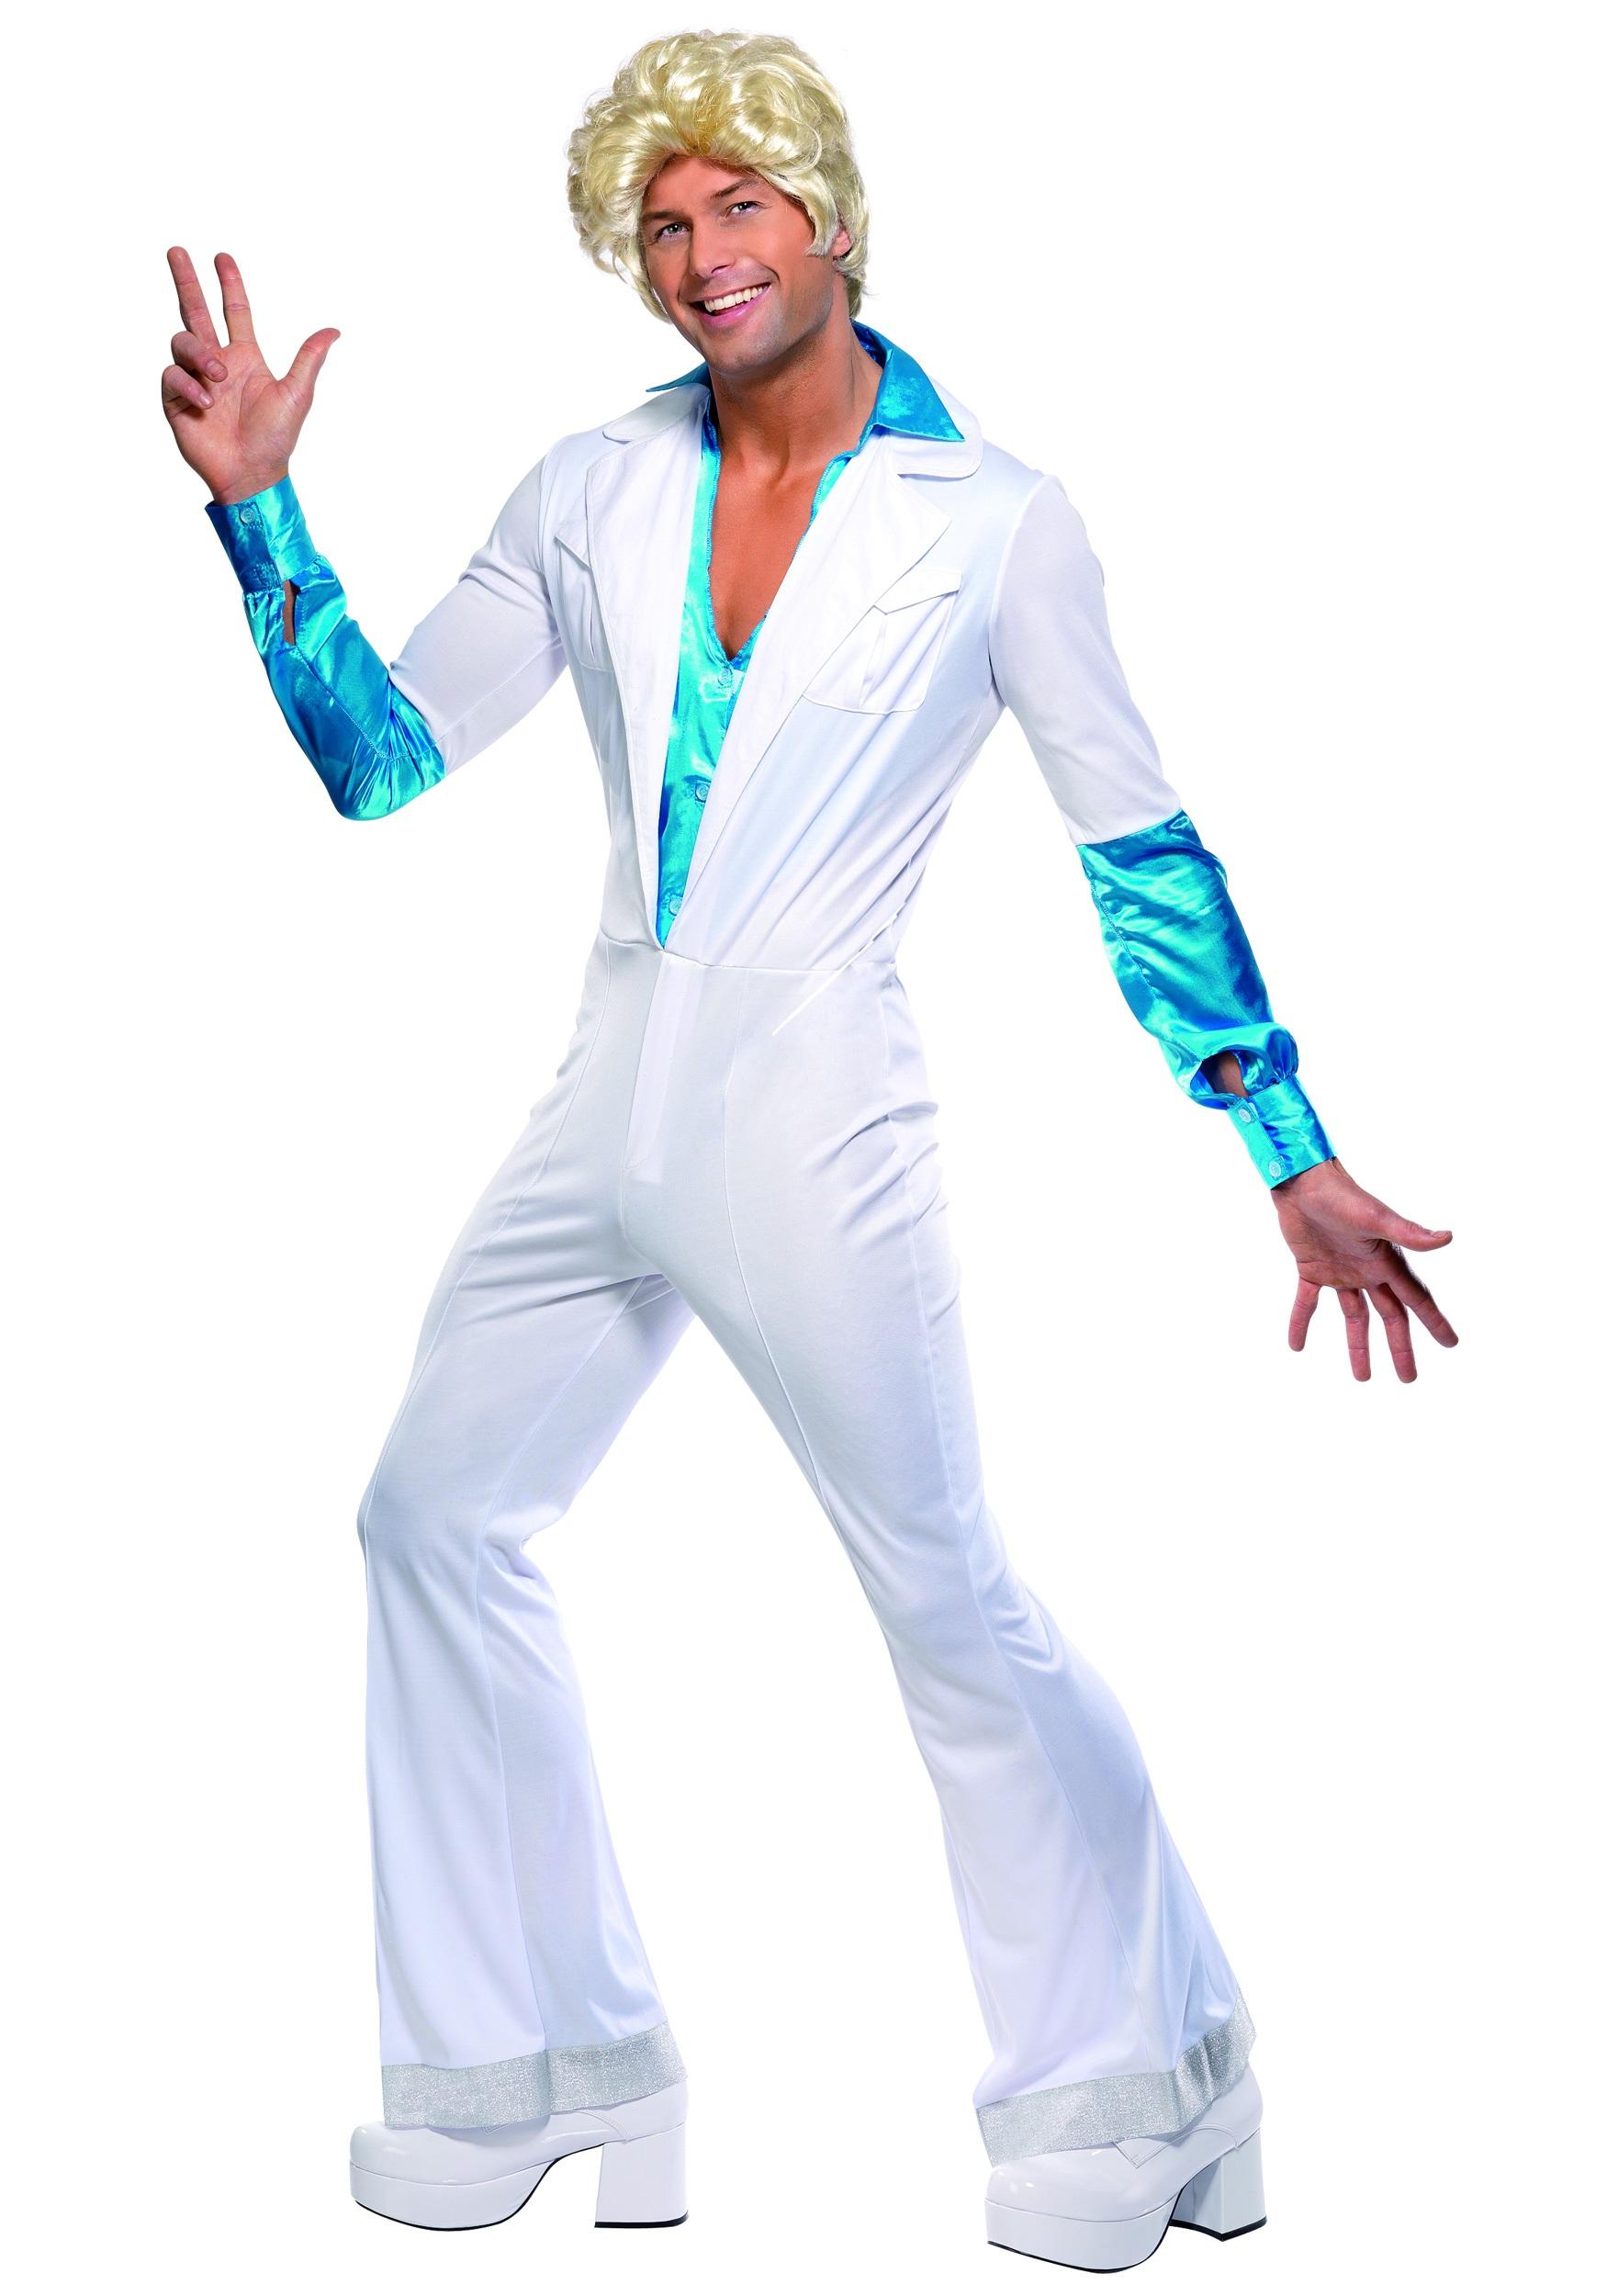 Disco Man 70s Costume  sc 1 st  Halloween Costume & Disco Man 70s Costume - 1970s Retro Funky Disco Halloween Costumes